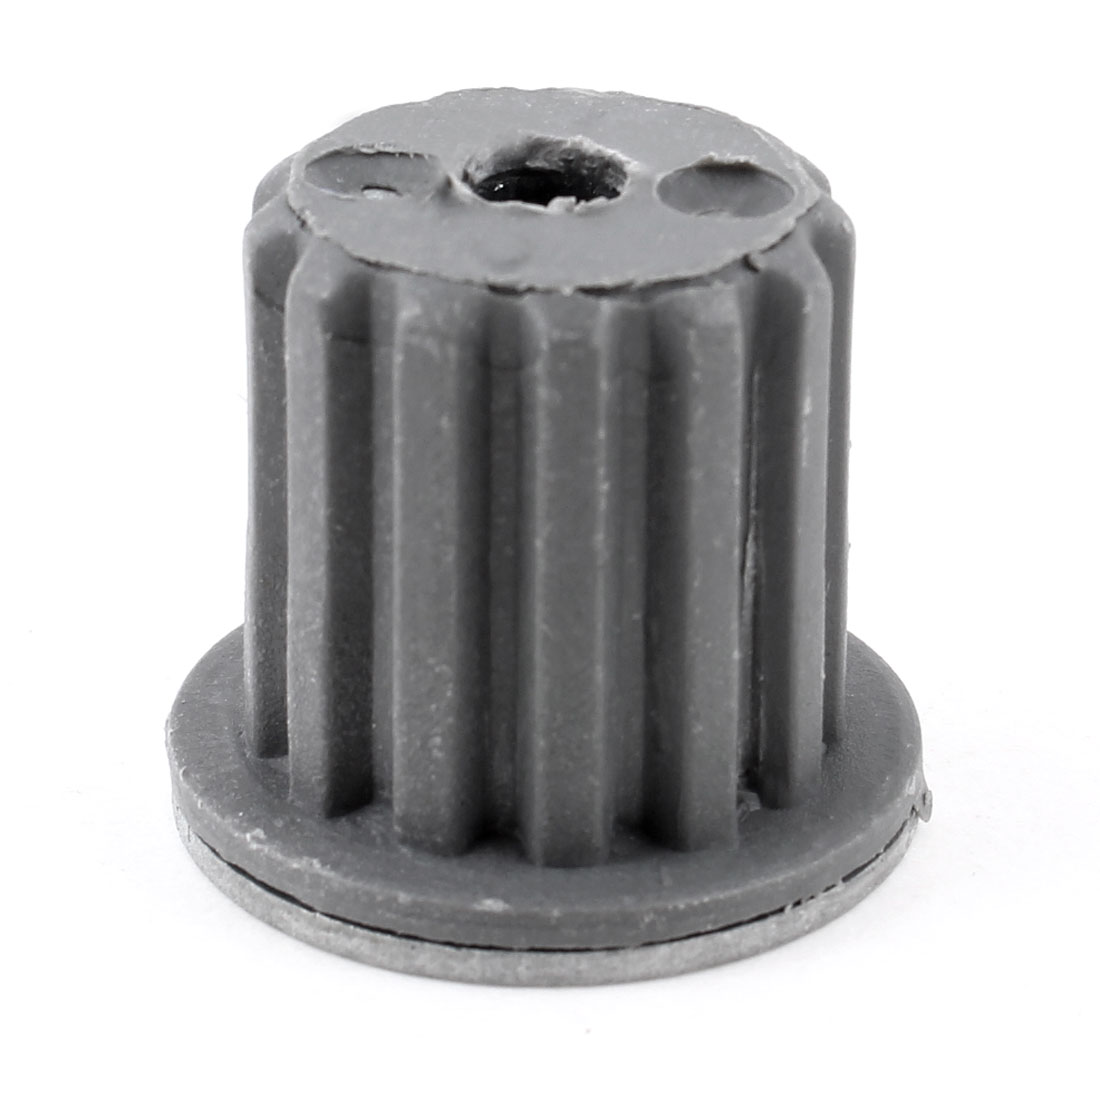 Gray 10 Interior Teeth Washing Machine Washer Metal Pulsator Core 25mm High